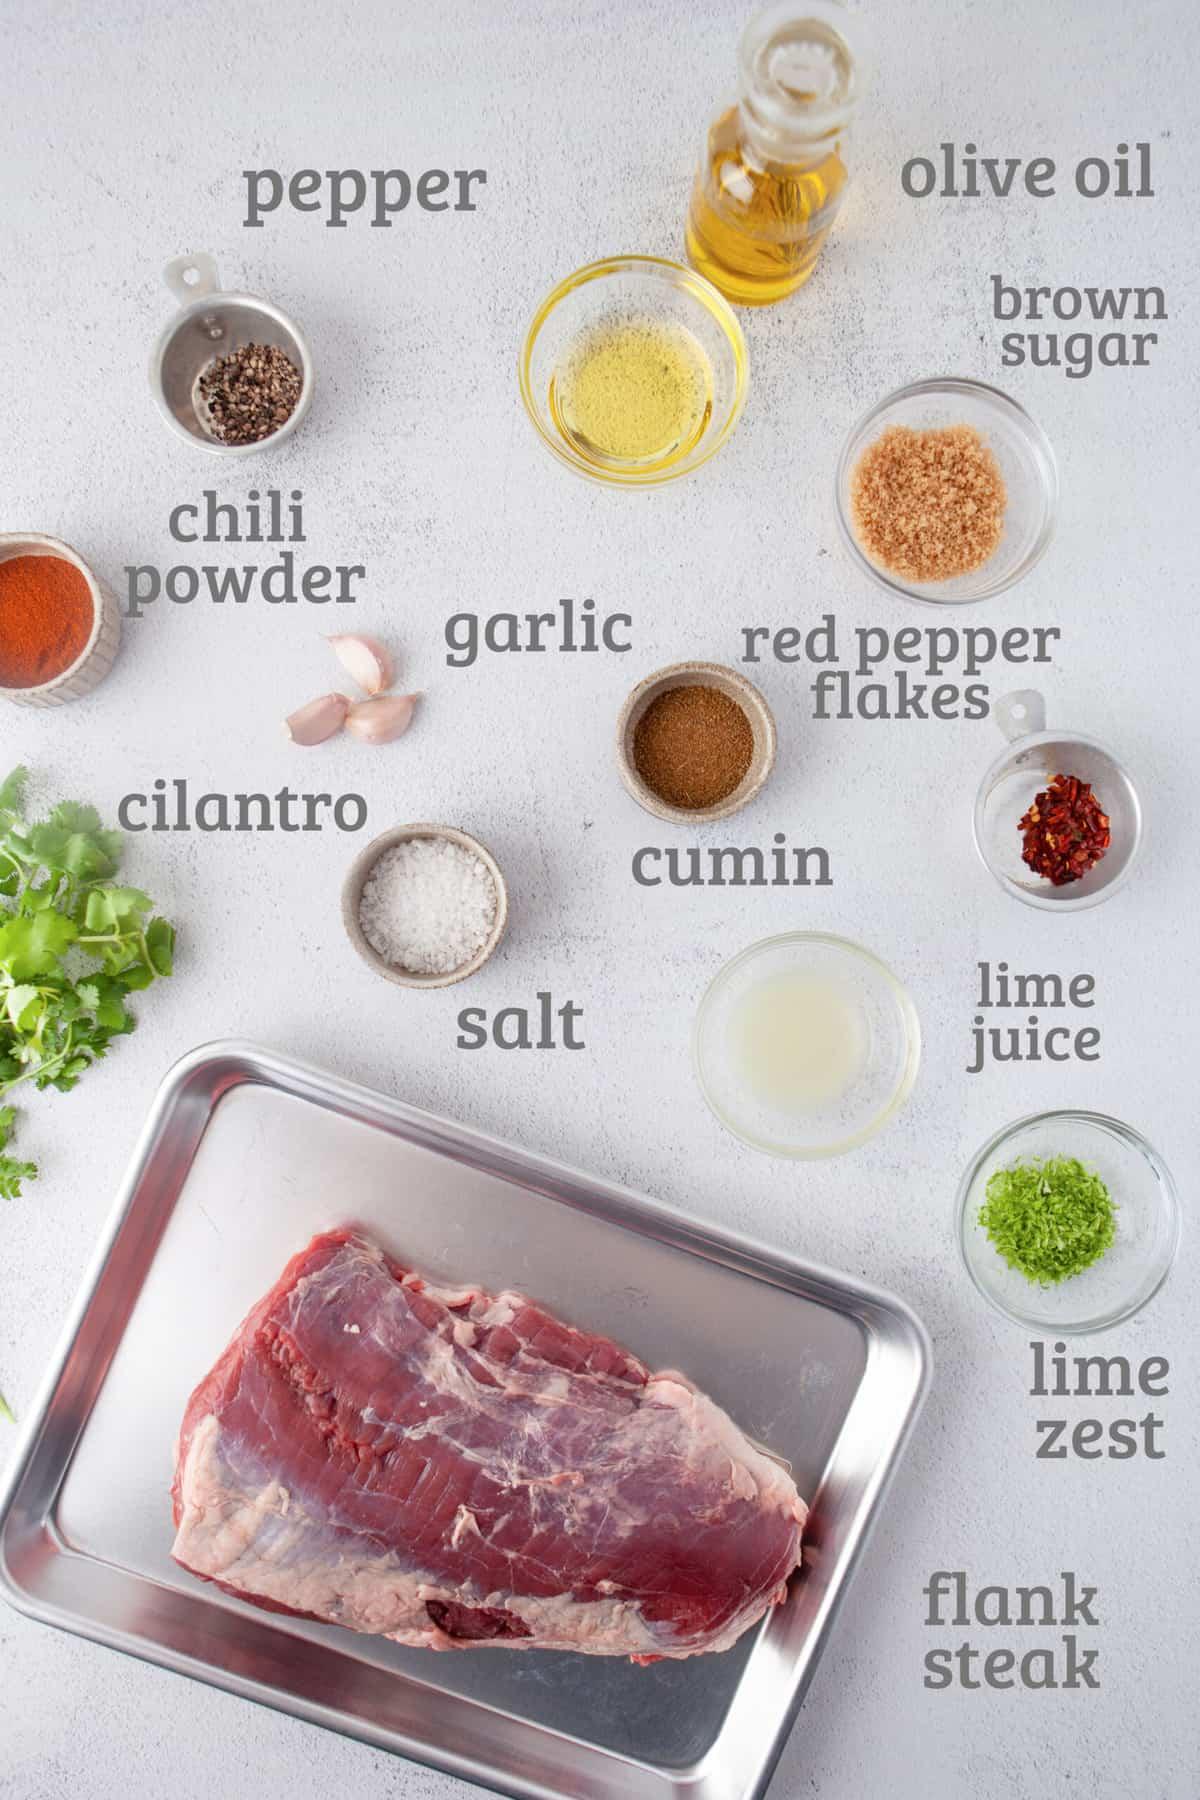 ingredients for grilled flank steak - steak, limes, sugar, garlic, olive oil, chili powder